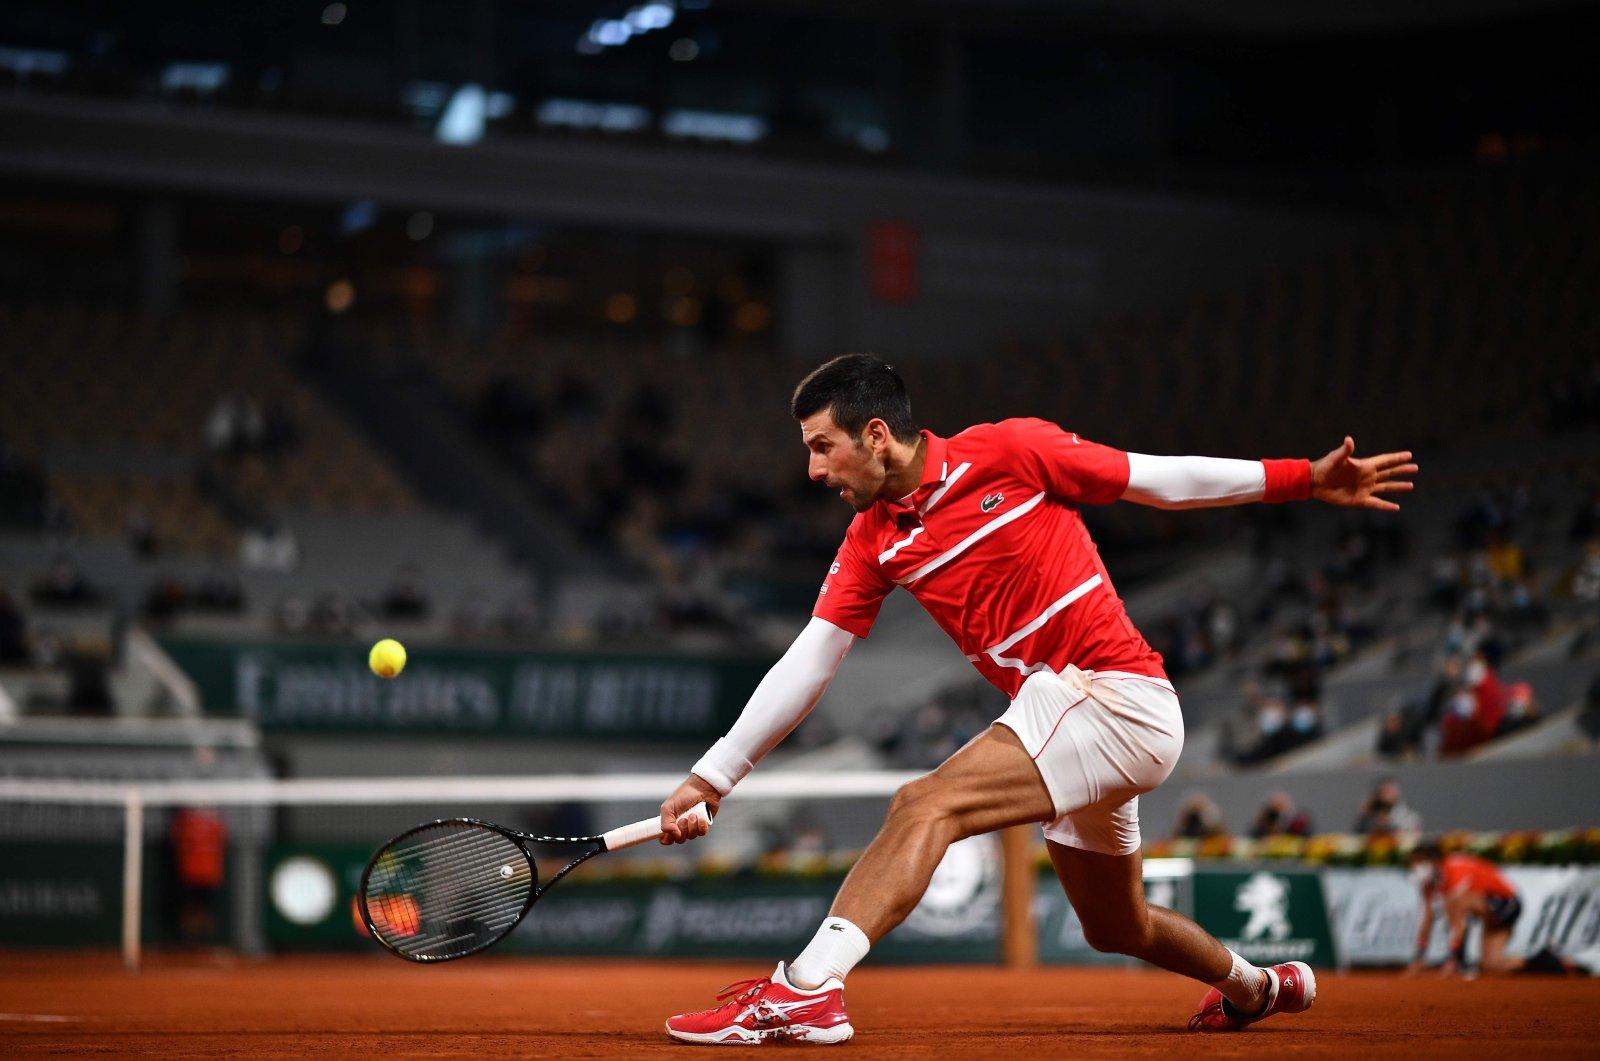 Serbia's Novak Djokovic returns the ball to Russia's Karen Khachanov during their men's singles fourth-round tennis match on Day 9 of the Roland Garros 2020 French Open tennis tournament in Paris, France, Oct. 5, 2020. (AFP Photo)